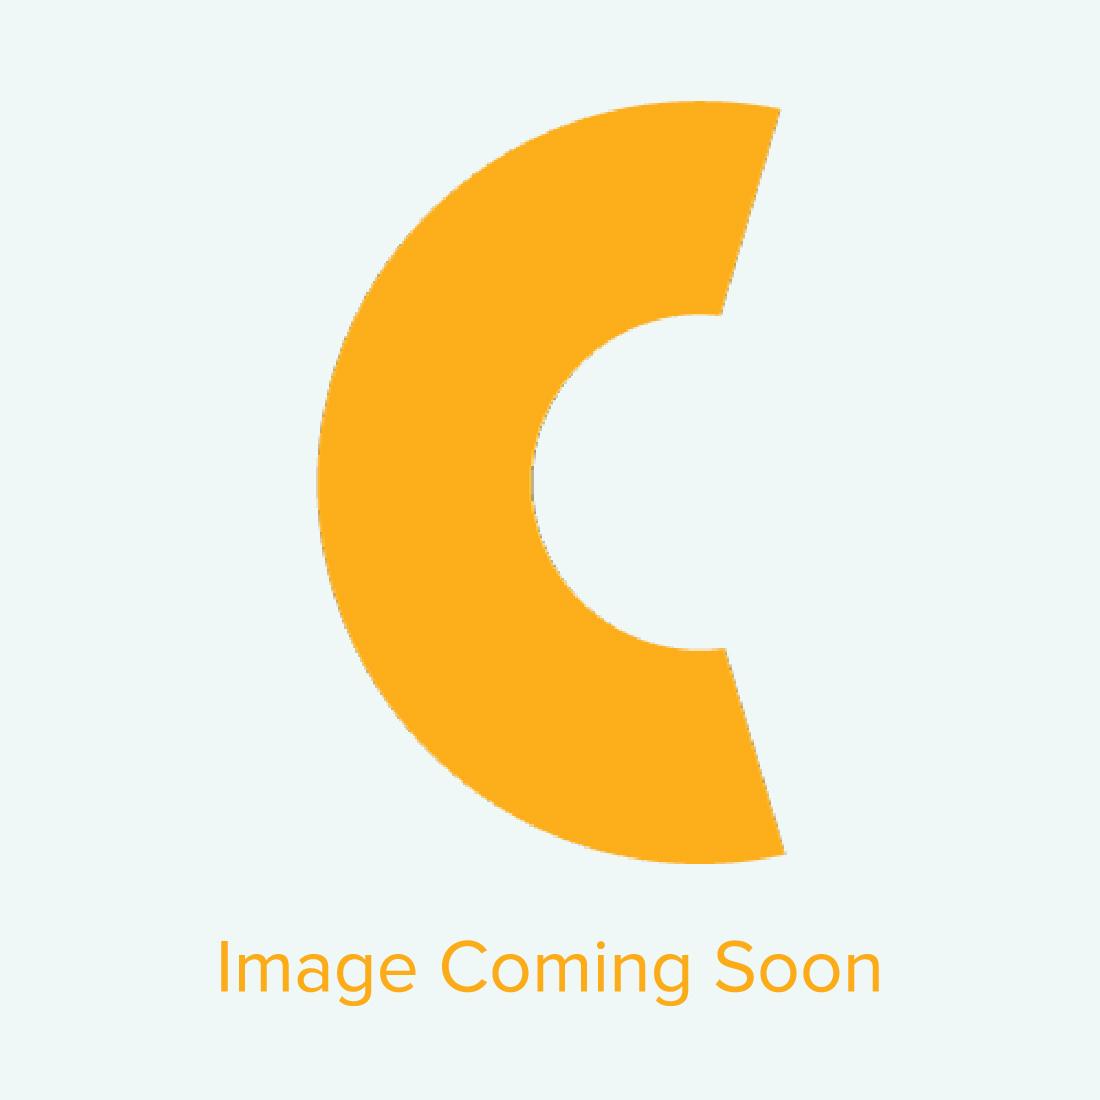 Chemica Chevron Designer Heat Transfer Vinyl - 5 yards - Red - CLEARANCE